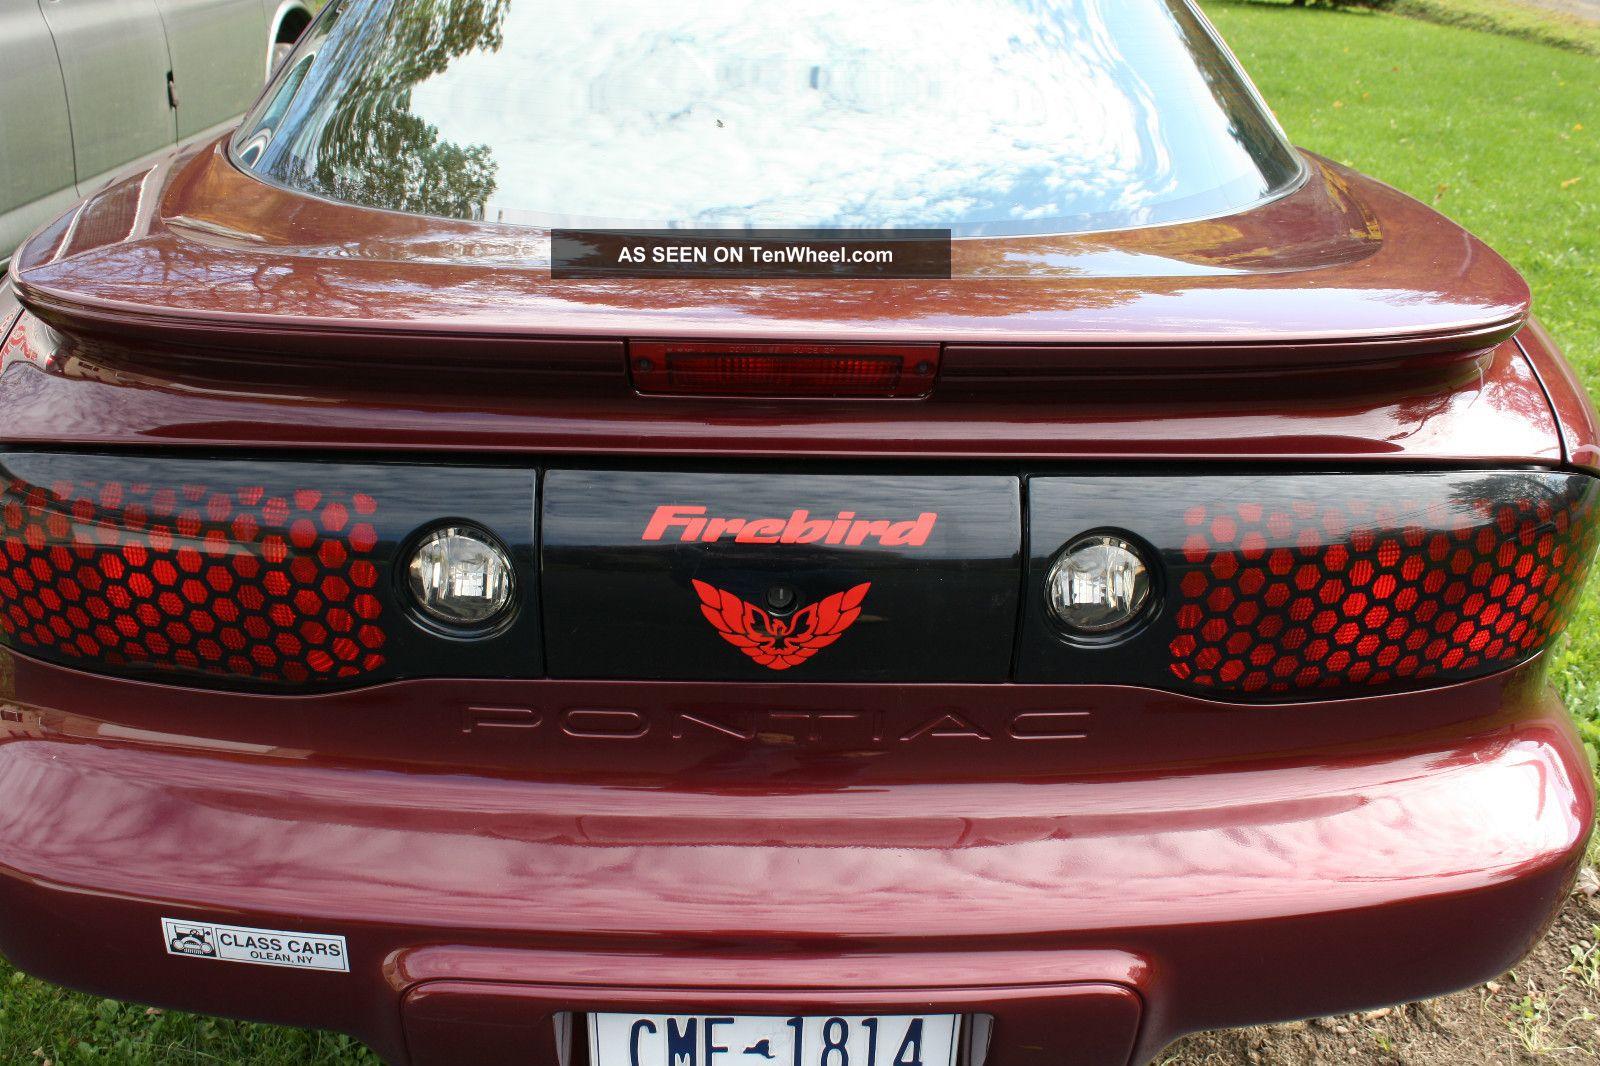 2000 pontiac firebird base coupe 2 door 3 8l. Black Bedroom Furniture Sets. Home Design Ideas